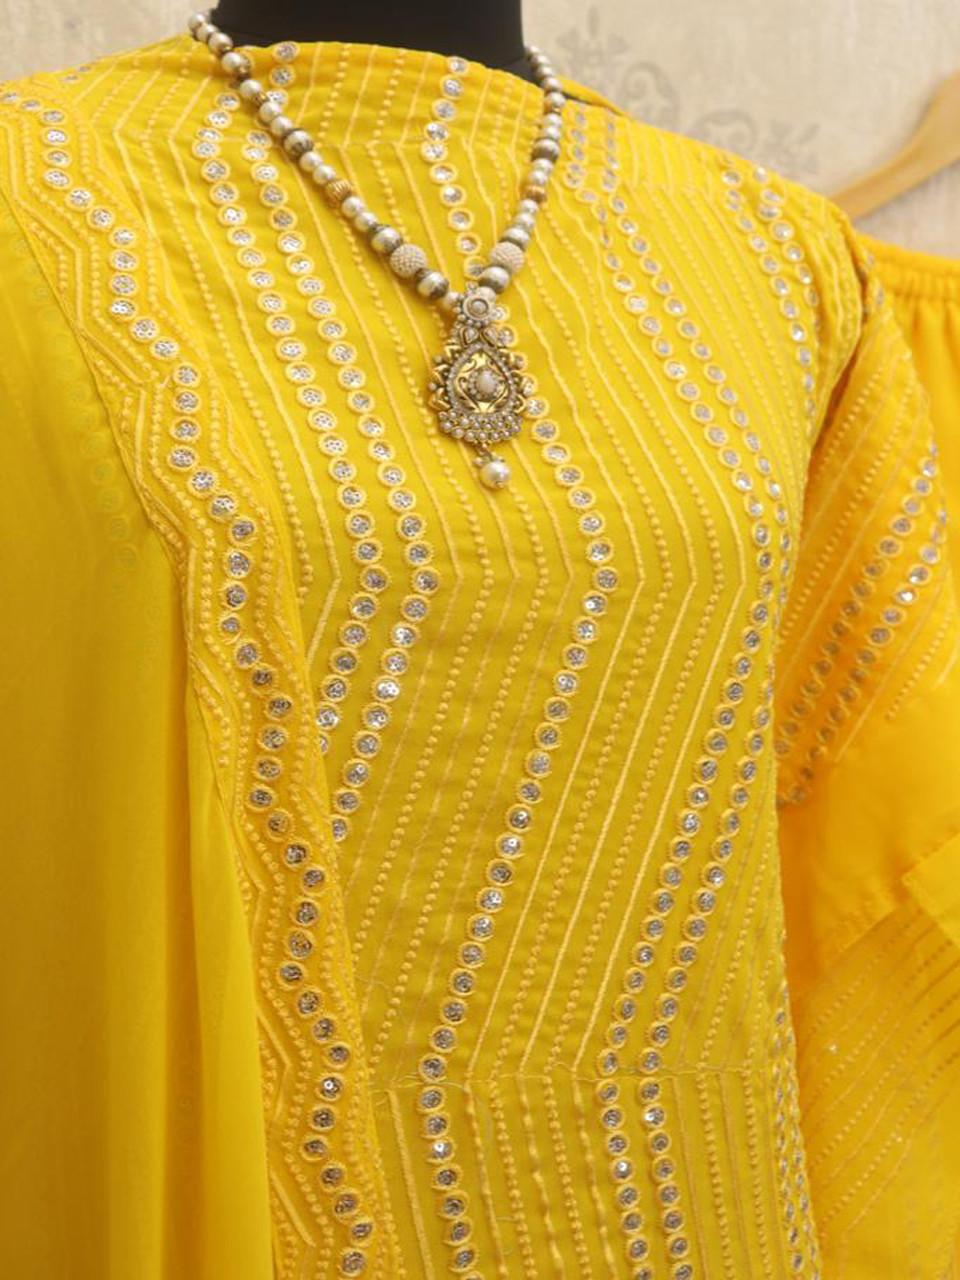 Yankita Kapoor Yellow Embroidered Kurti Plazo Suit